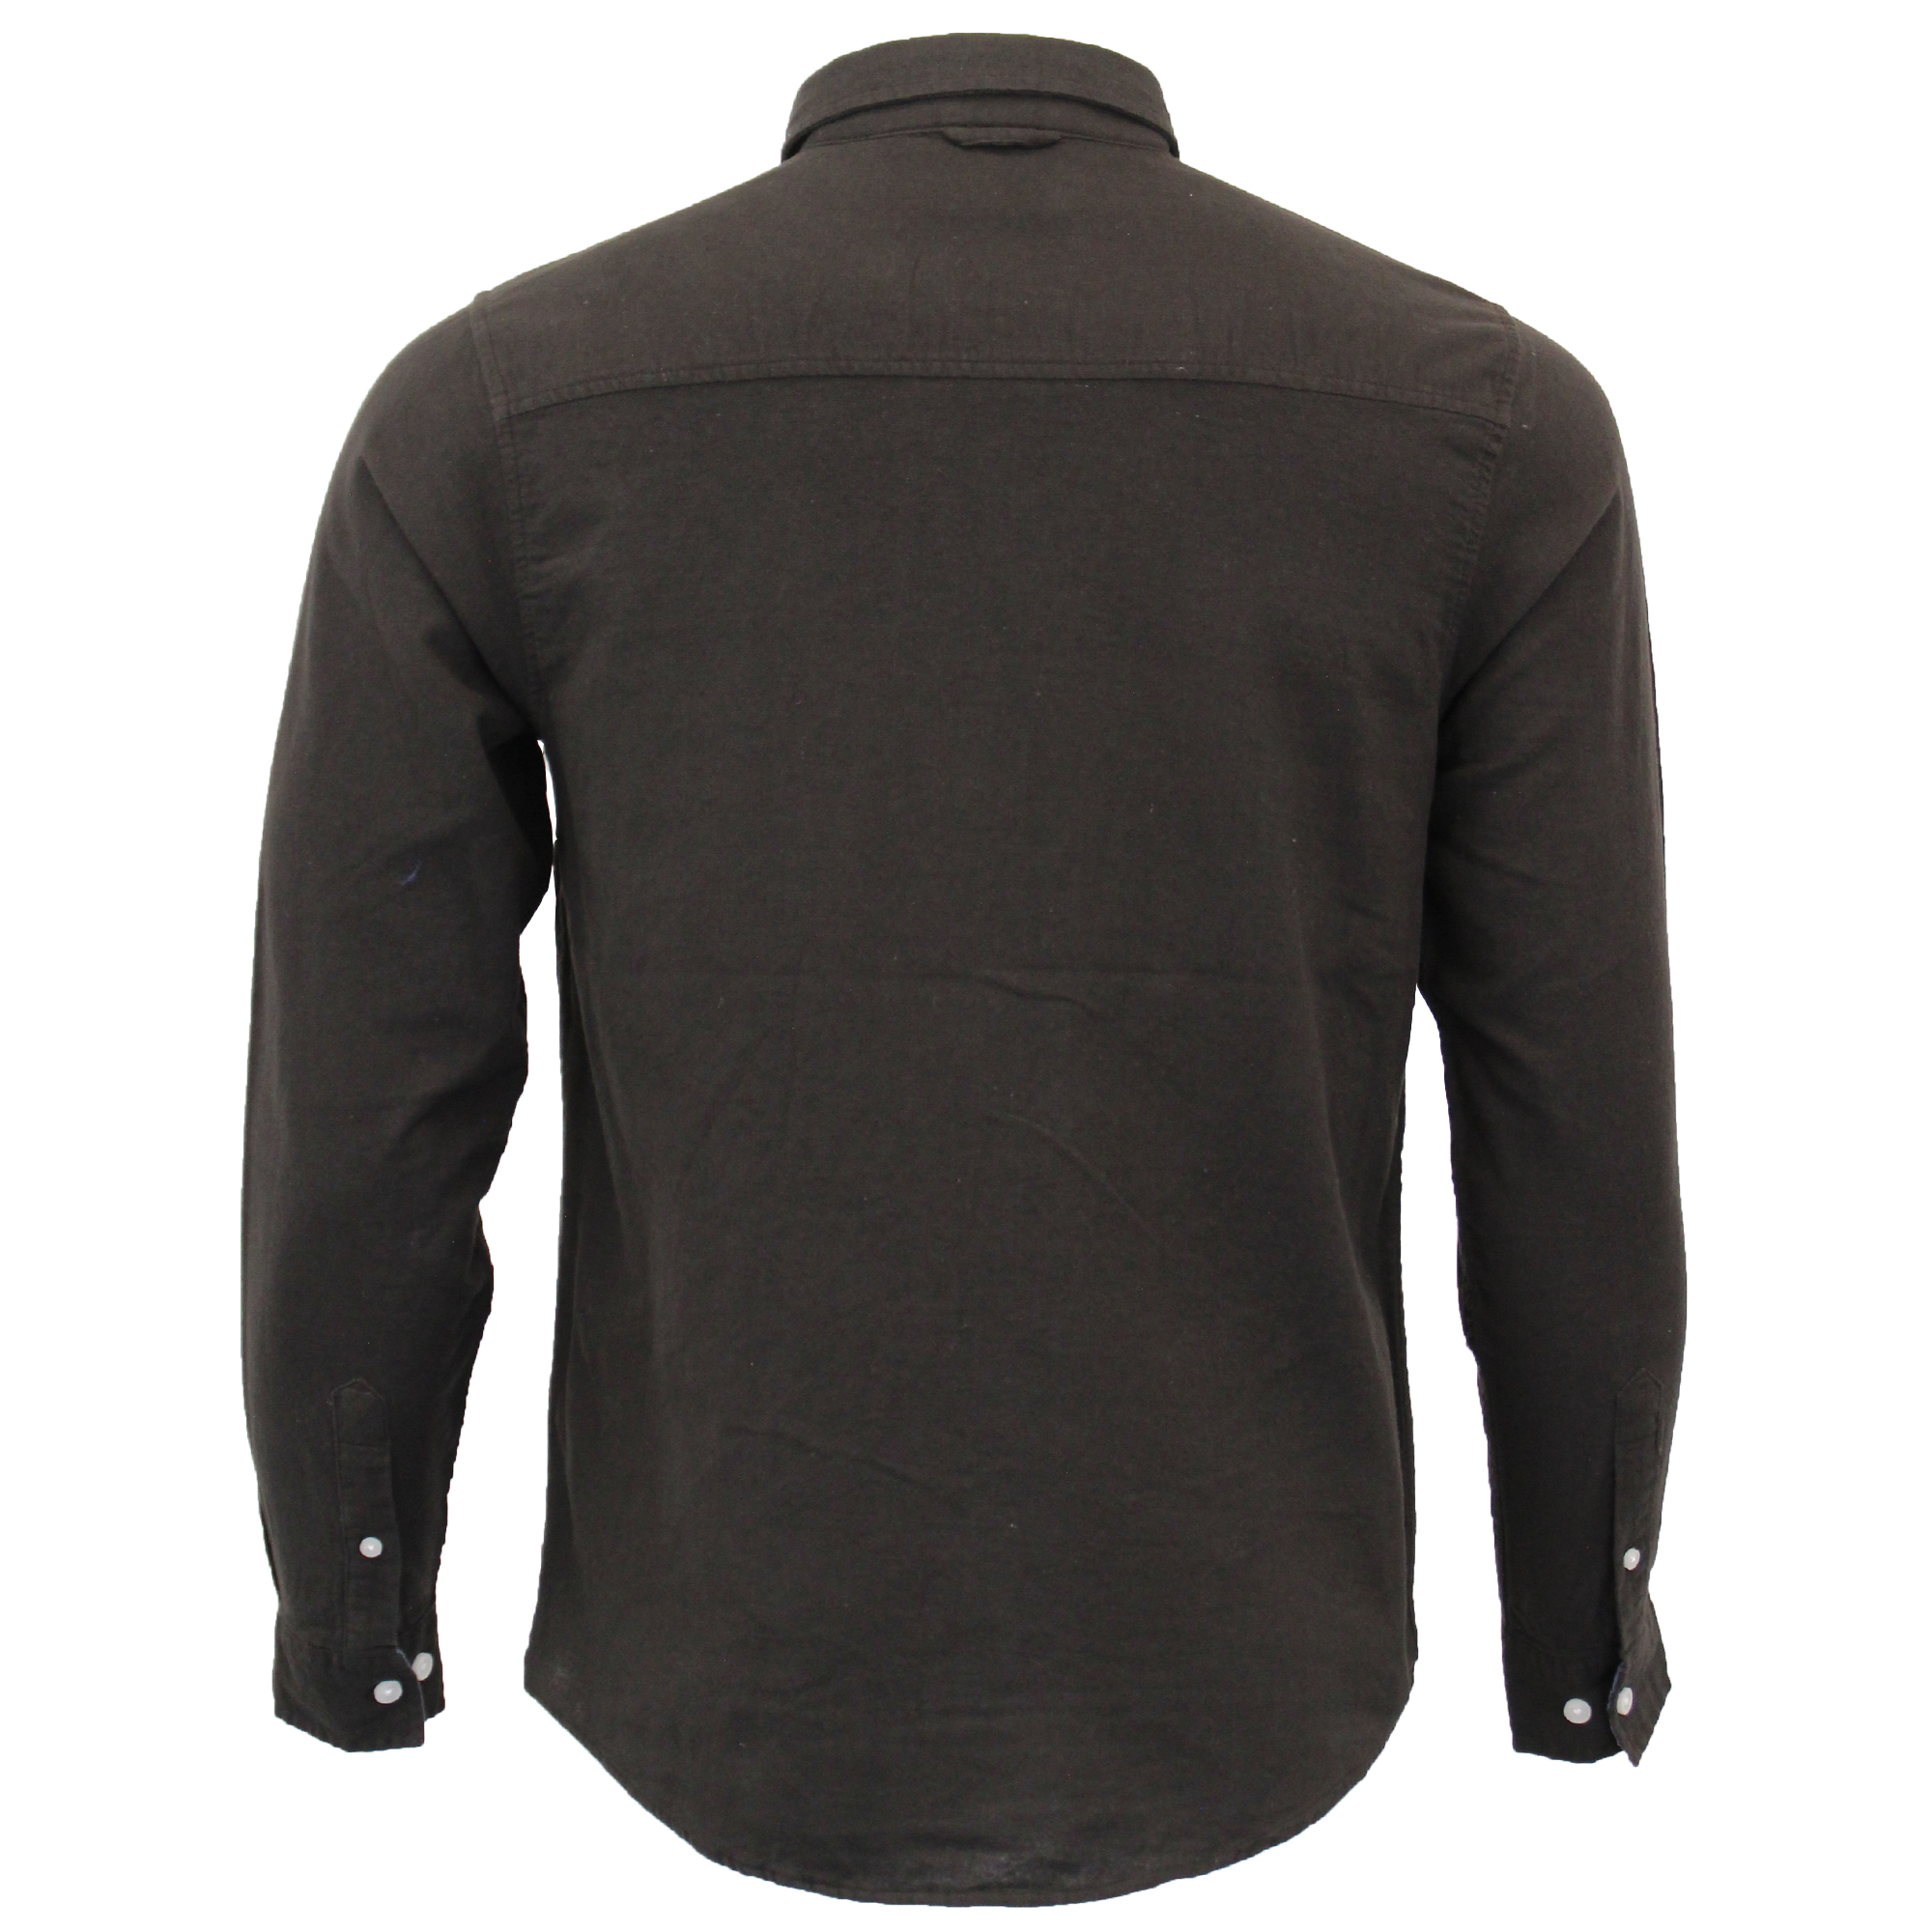 Mens-Brushed-Cotton-Shirt-Brave-Soul-Long-Sleeved-Flannel-HOLMES-Casual-Designer thumbnail 6